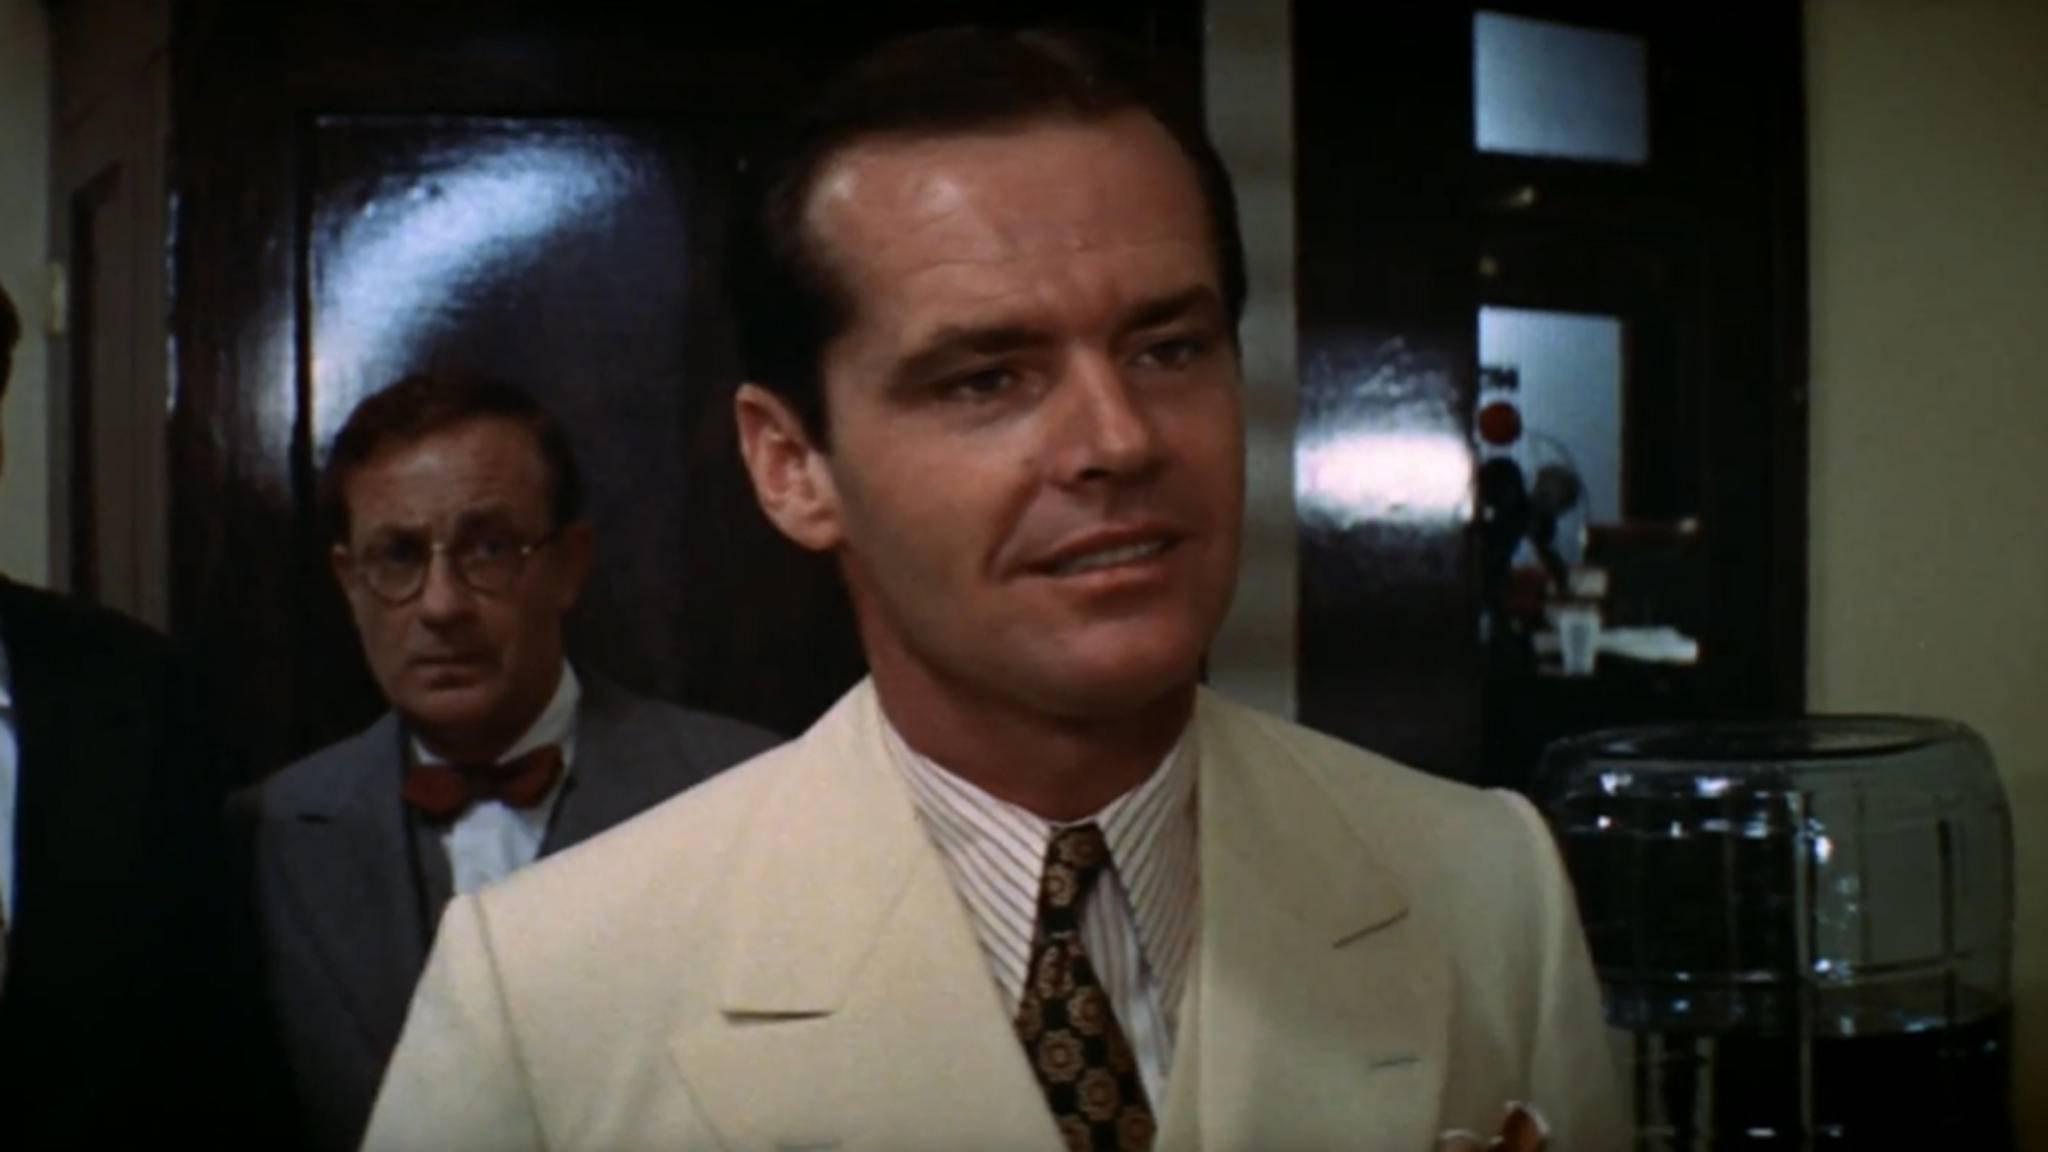 Chinatown Jack Nicholson